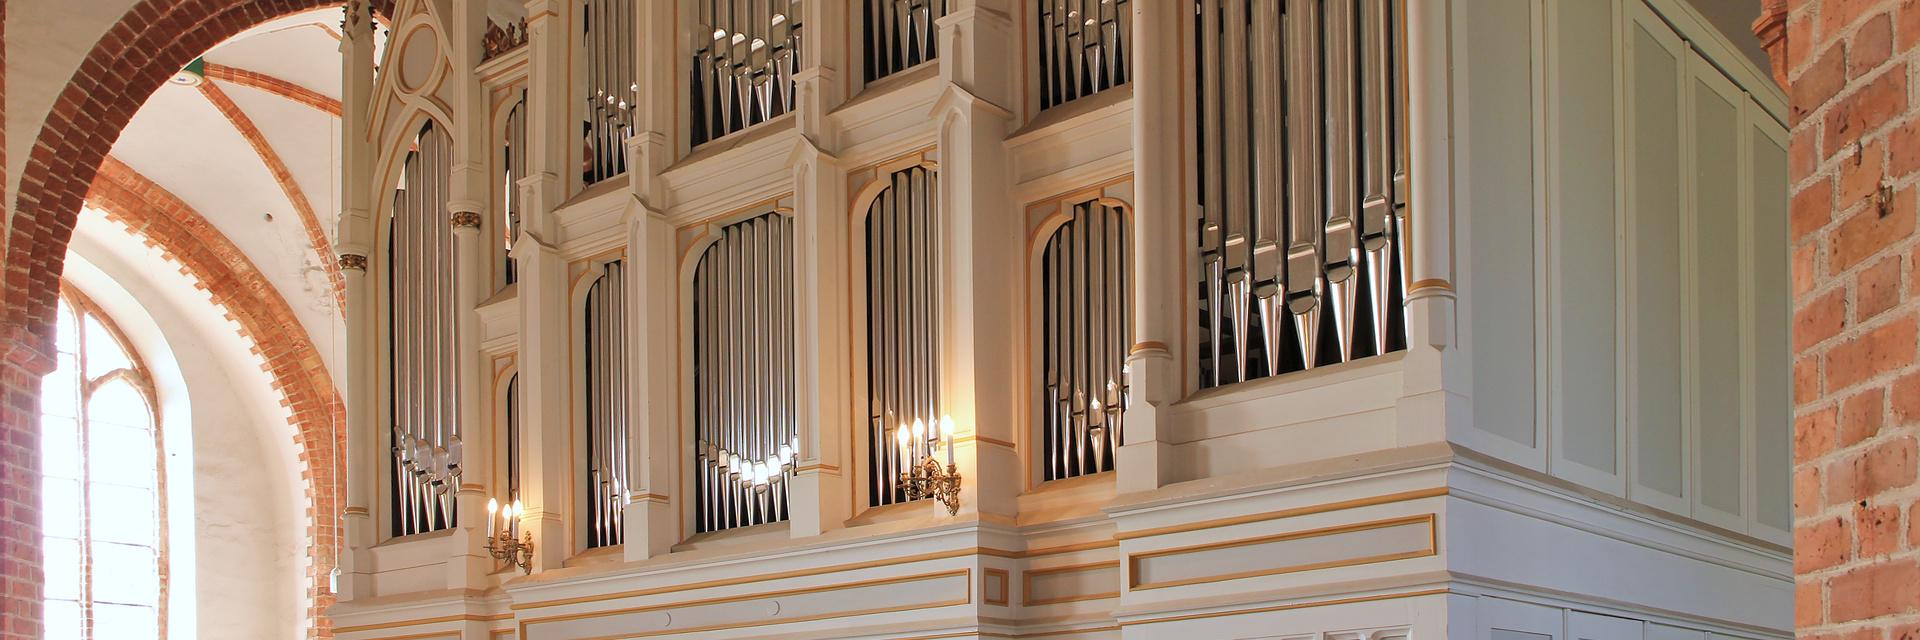 beitrag-orgel-prospekt